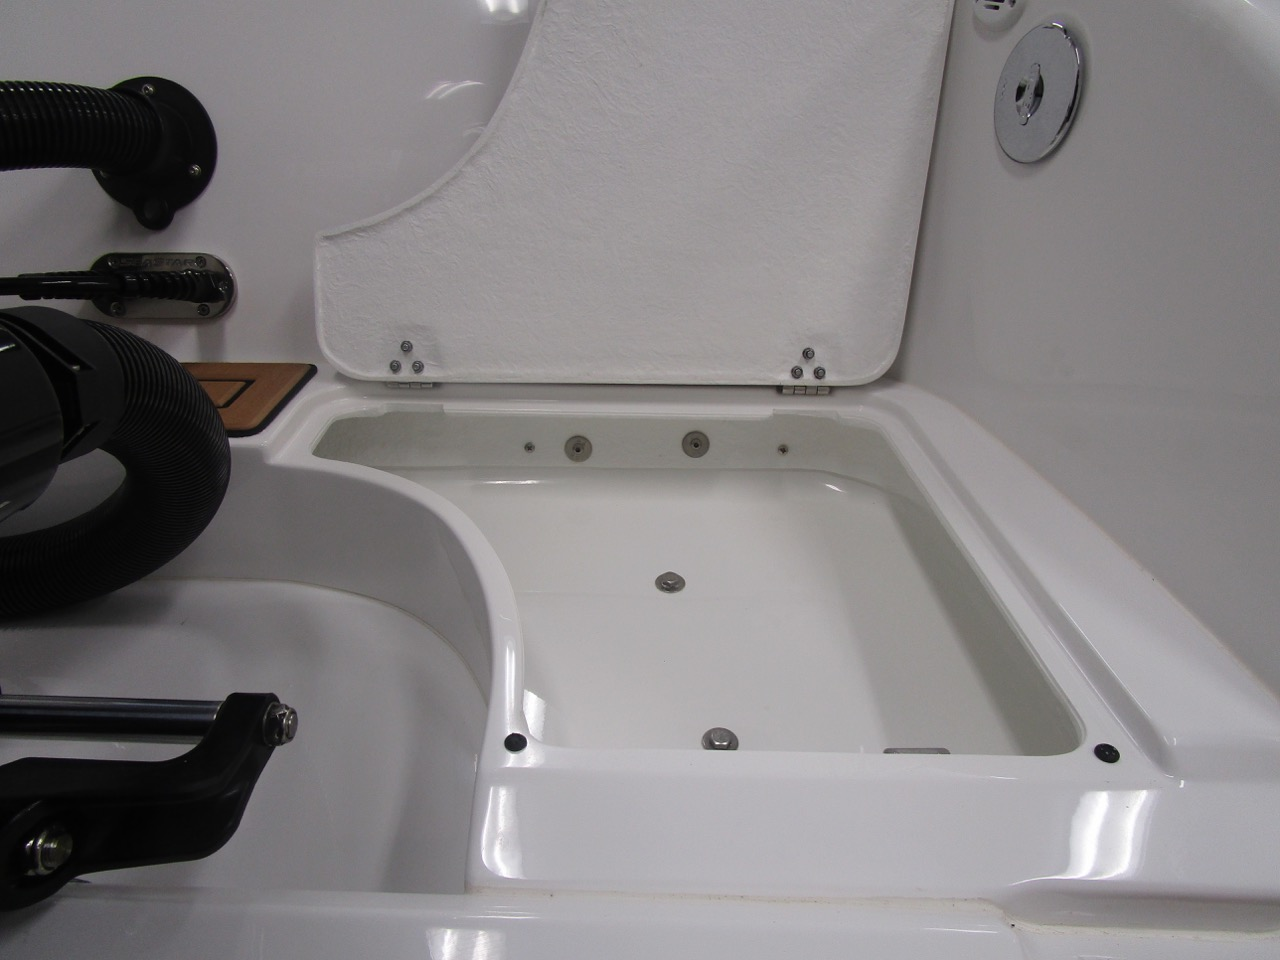 GRAND G850 RIB splash well locker - open